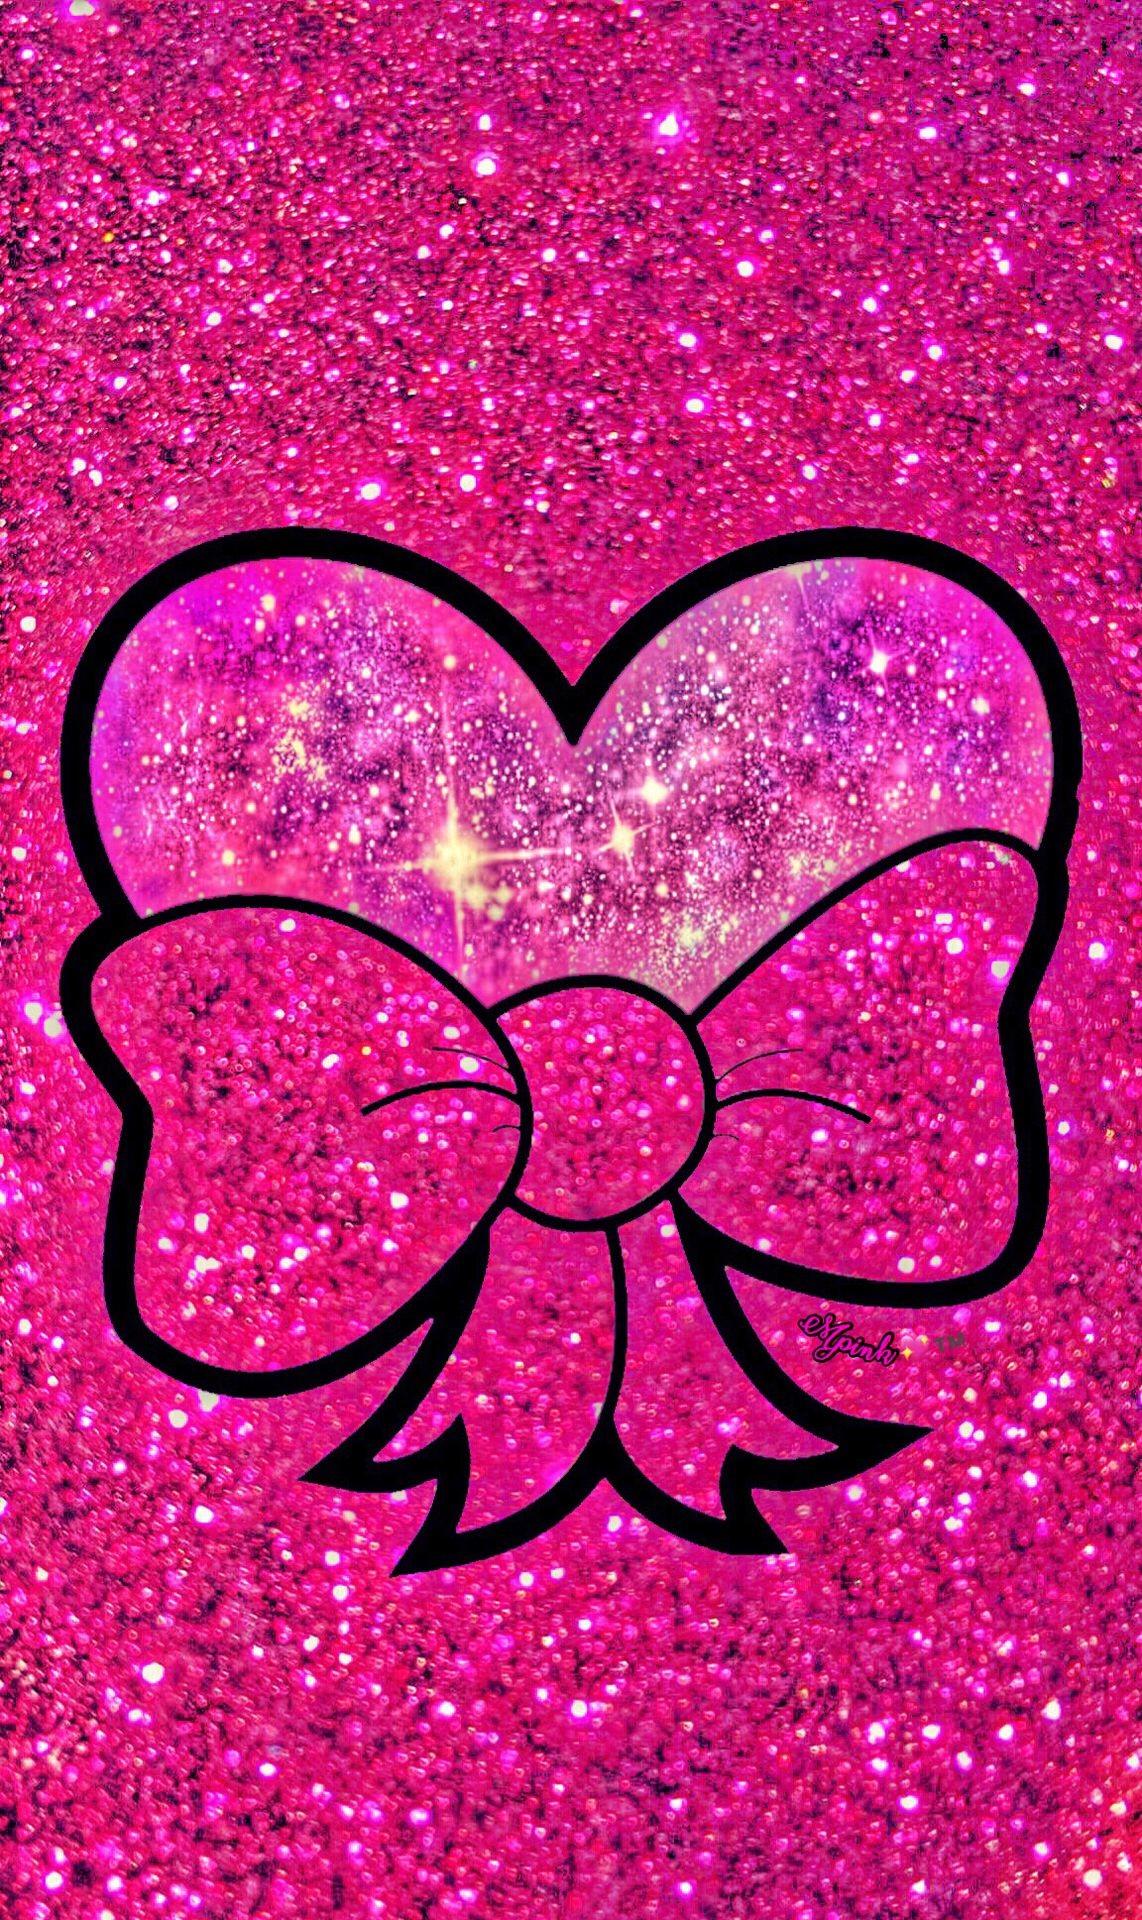 Res: 1142x1920, Pink Bling Heart Galaxy Wallpaper #androidwallpaper #iphonewallpaper # wallpaper #galaxy #sparkle #